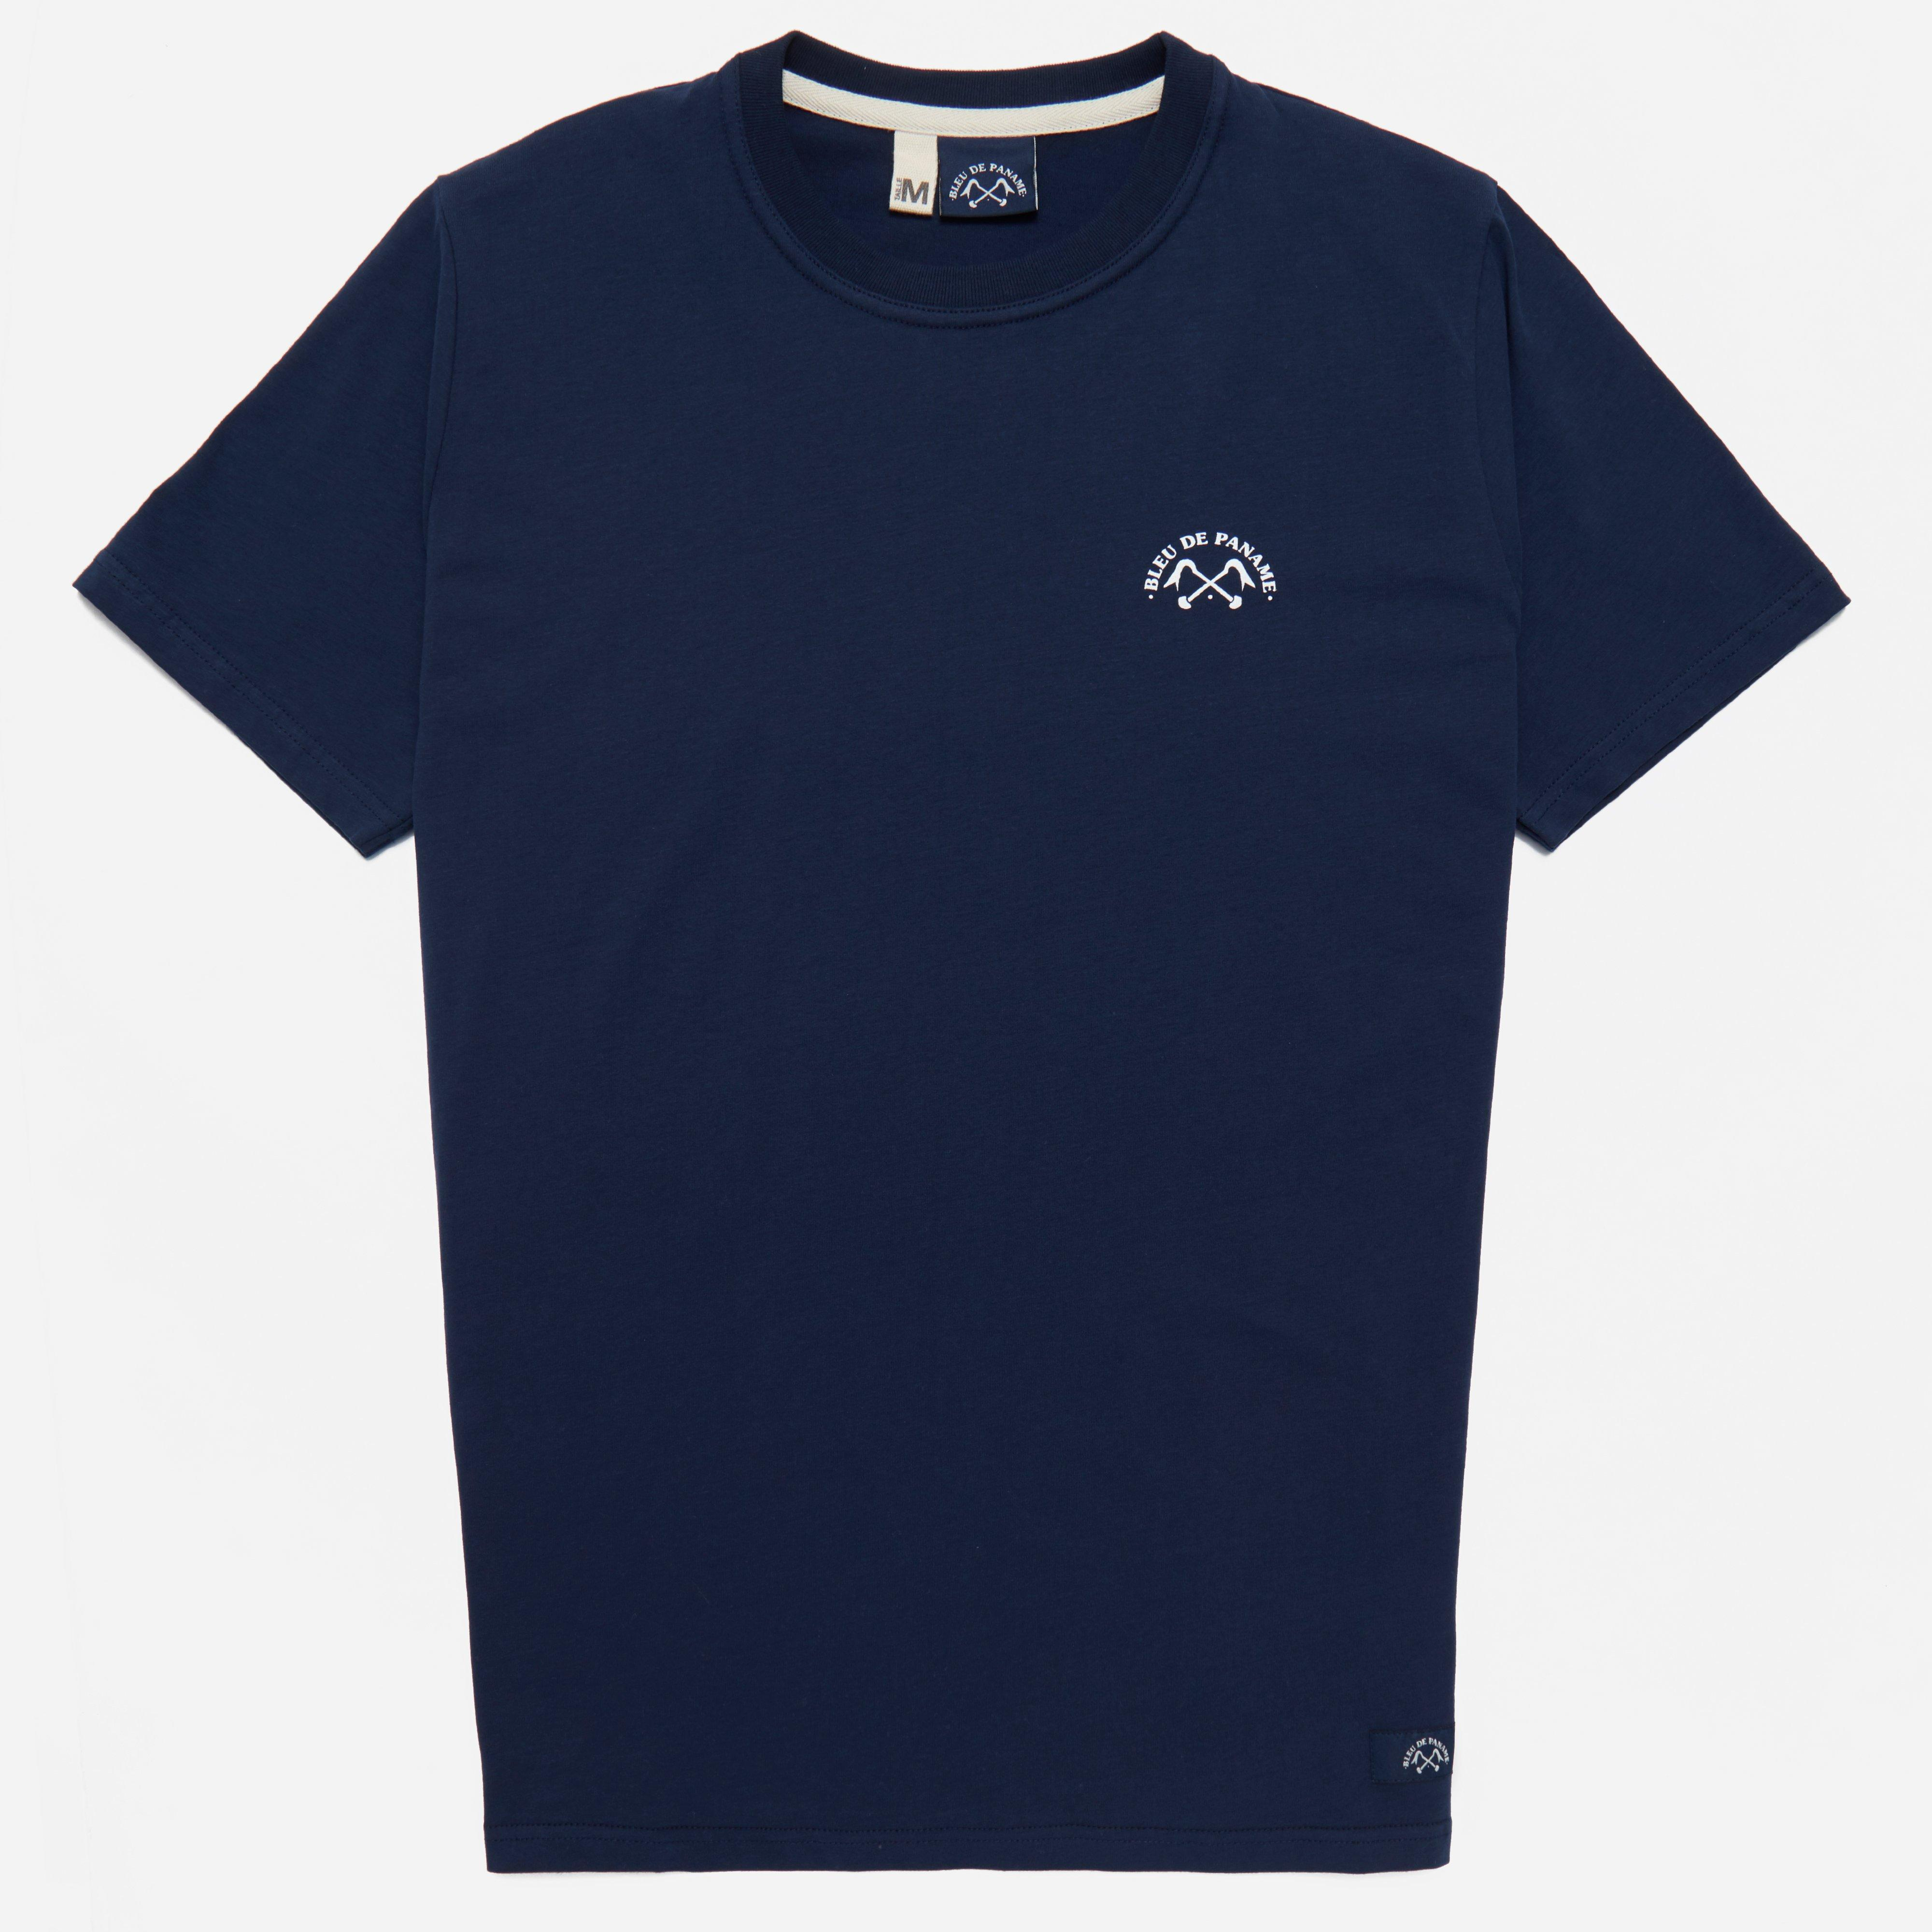 Bleu De Paname Mini BDP T-shirt